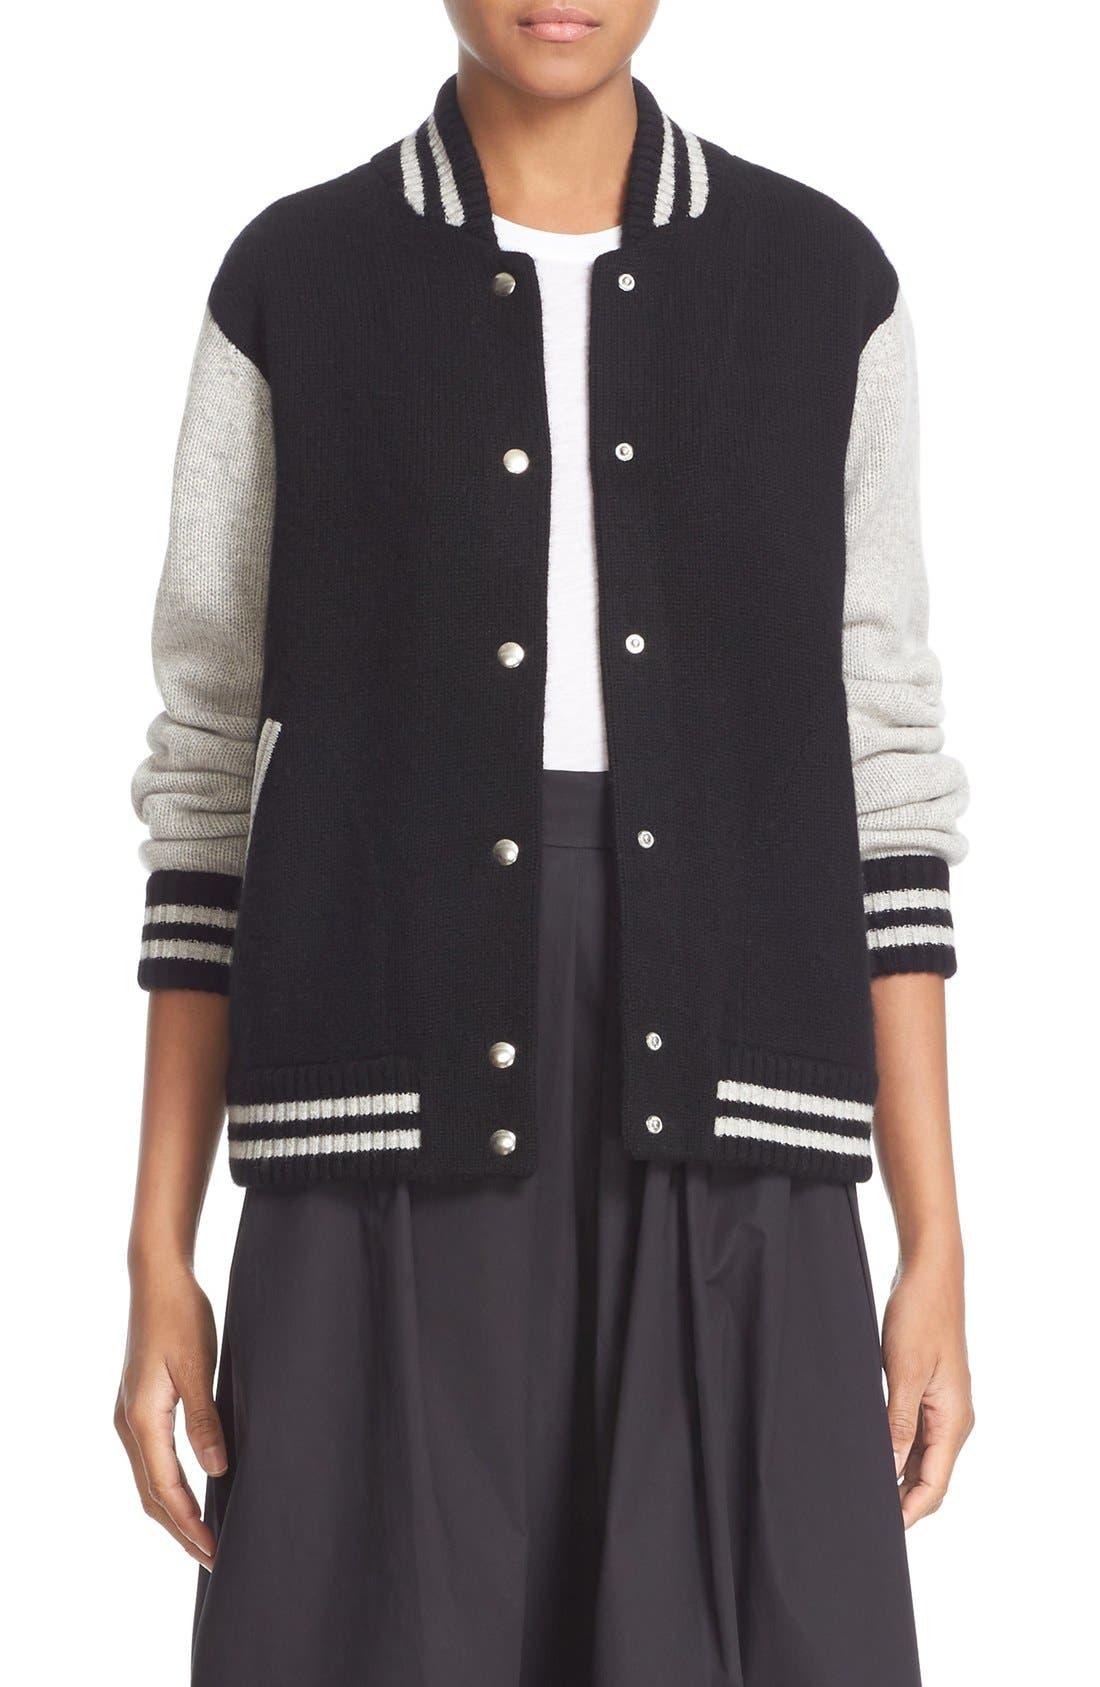 Stripe Detail Wool & Cashmere Knit Varsity Jacket,                             Main thumbnail 1, color,                             002